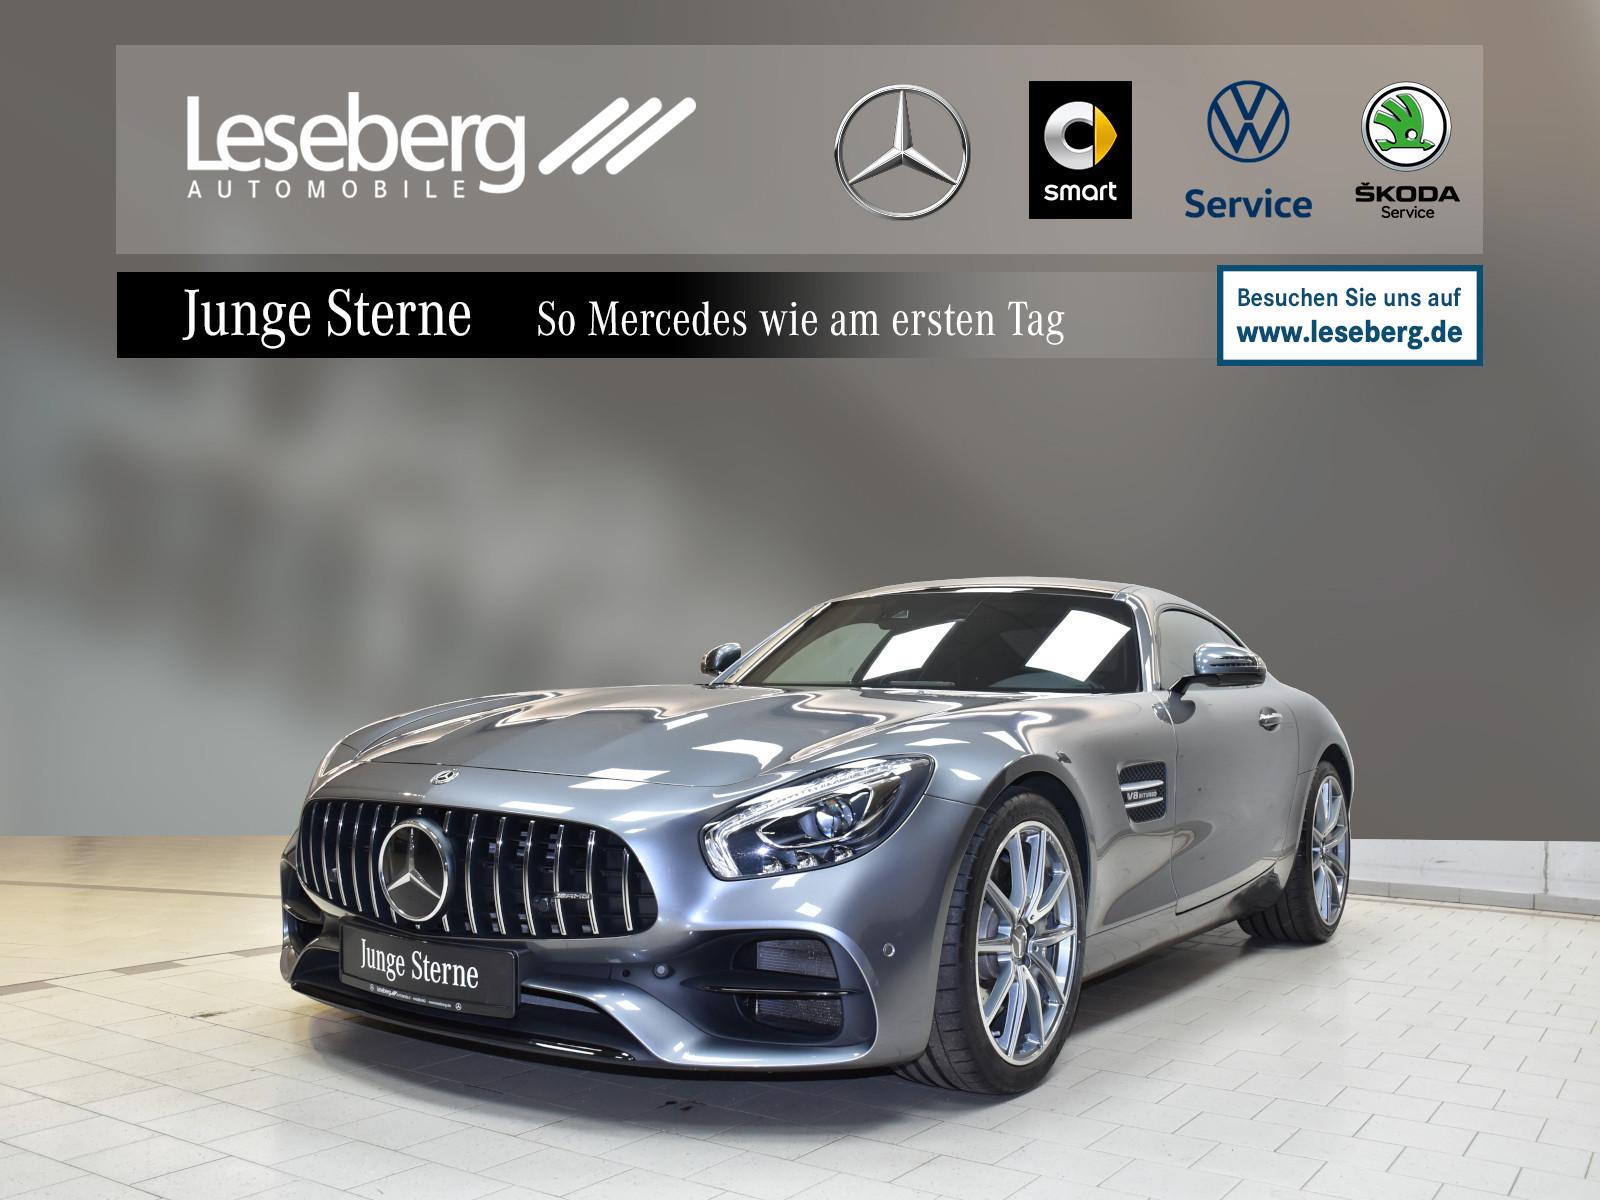 Mercedes-Benz AMG GT Coupé Kamera/LED/COMAND/Keyless/Distronic, Jahr 2016, Benzin